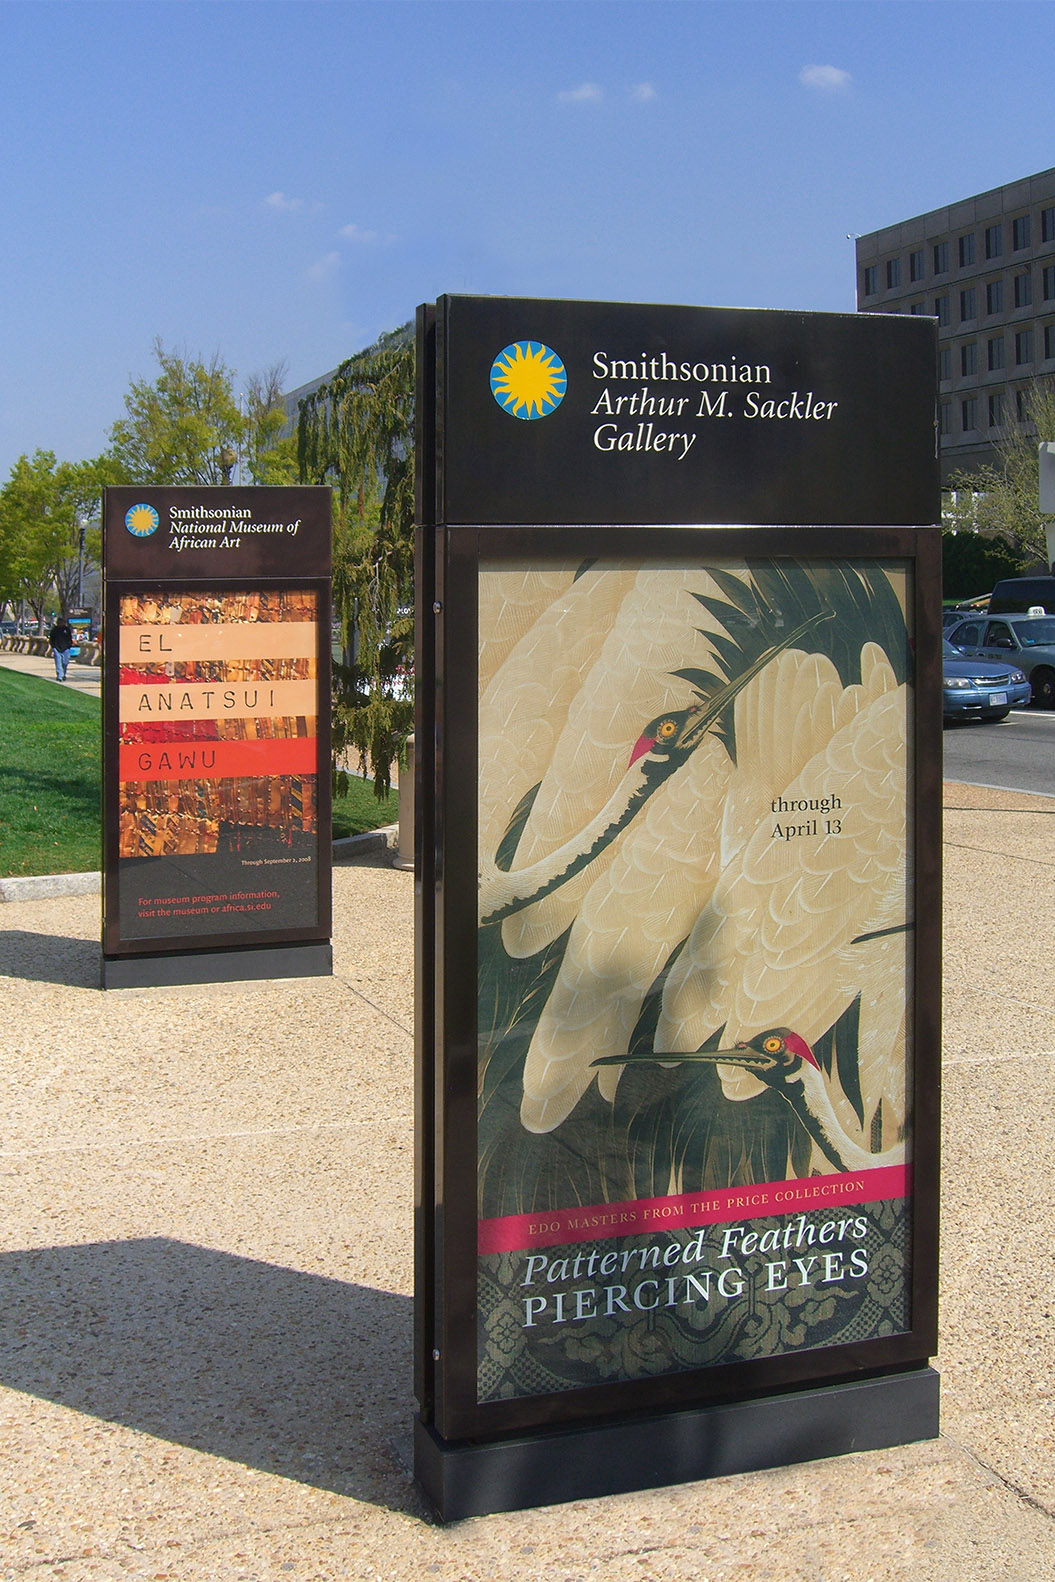 Smithsonian photo